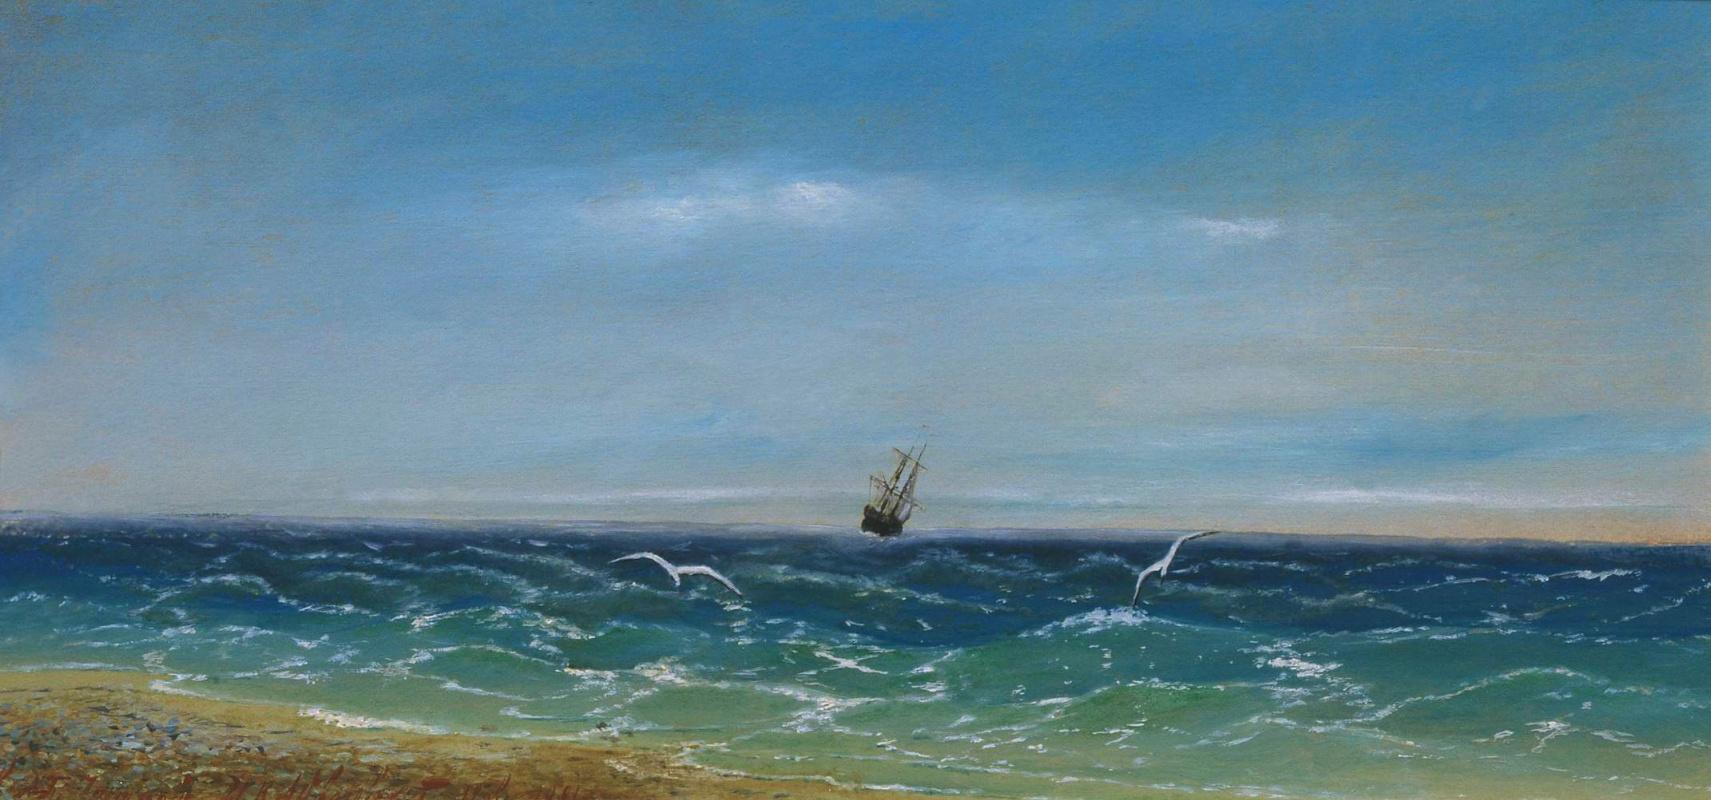 Ivan Aivazovsky. Sailboat in the sea